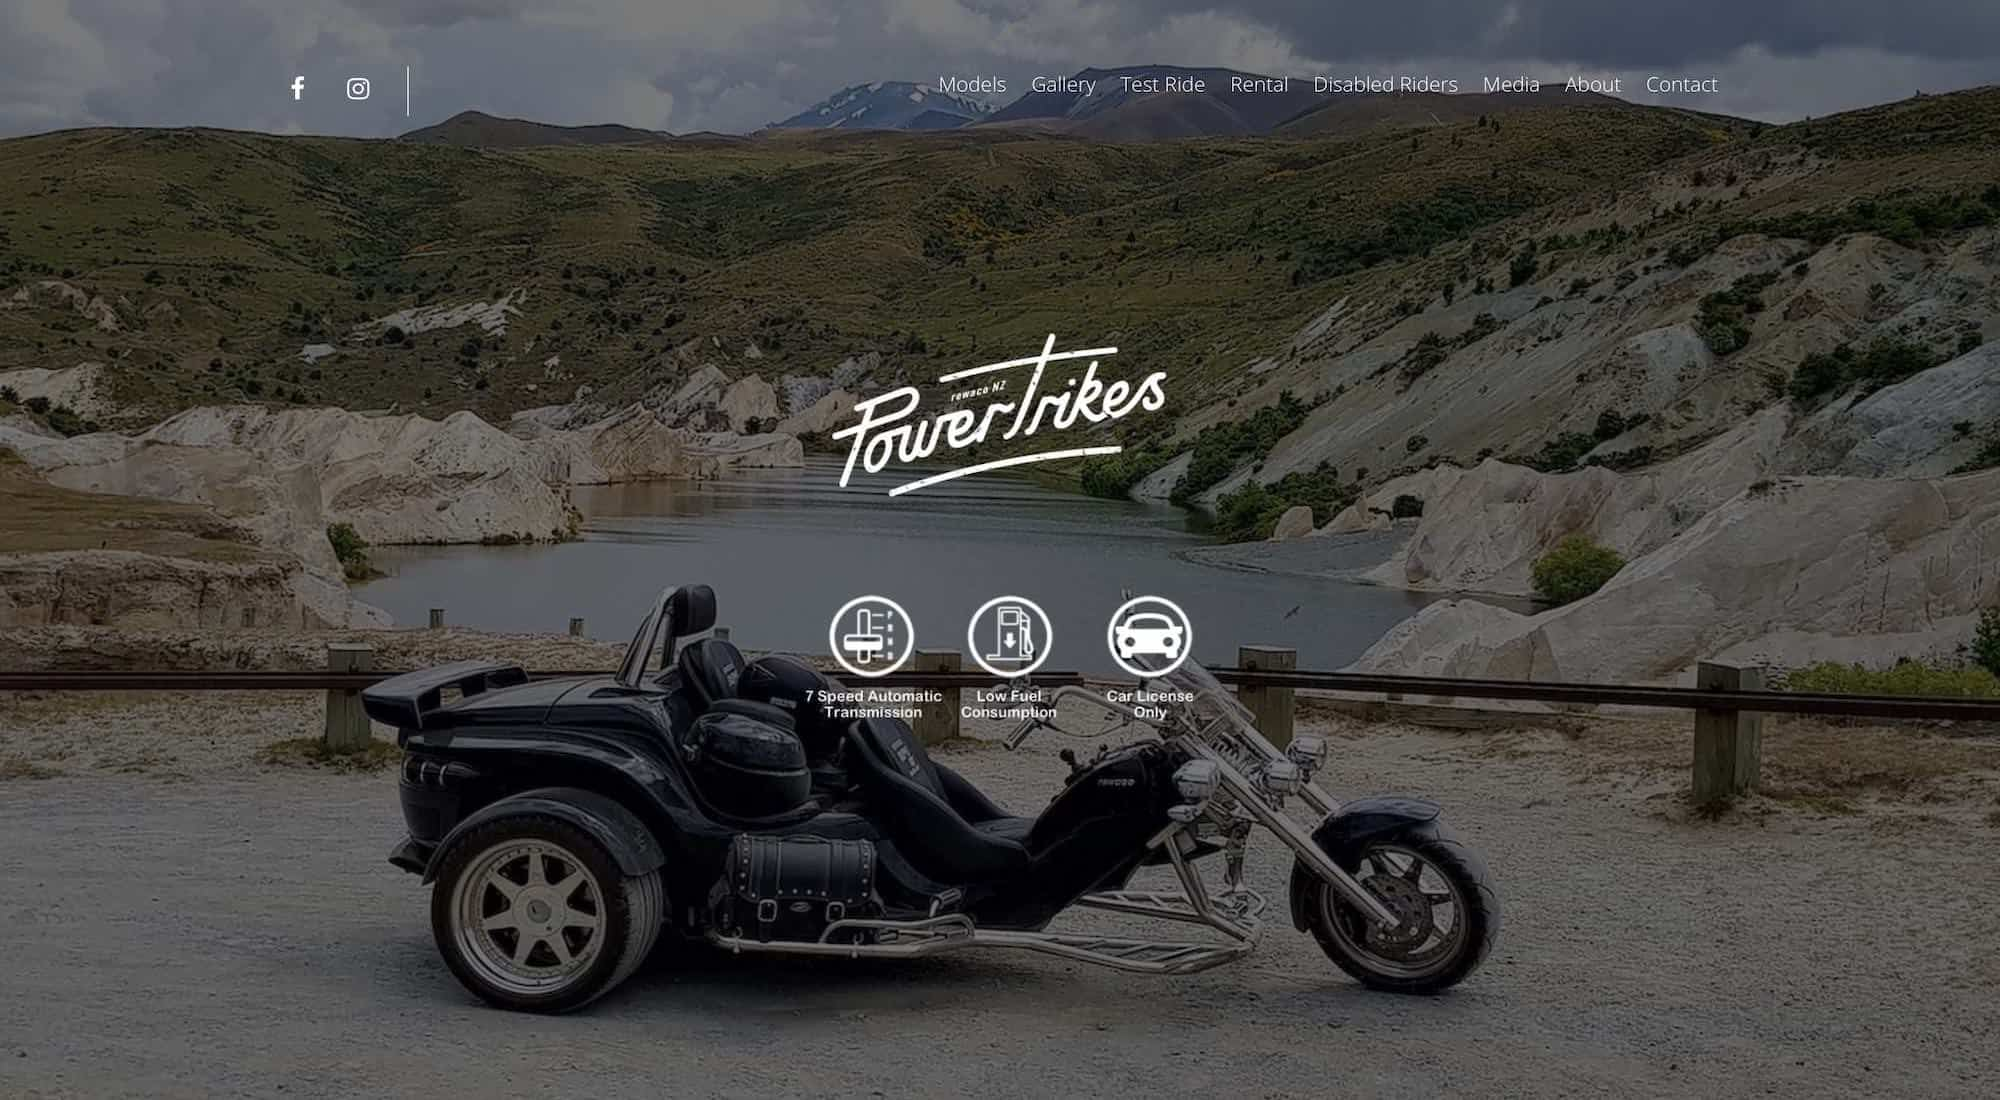 NZ Power Trikes